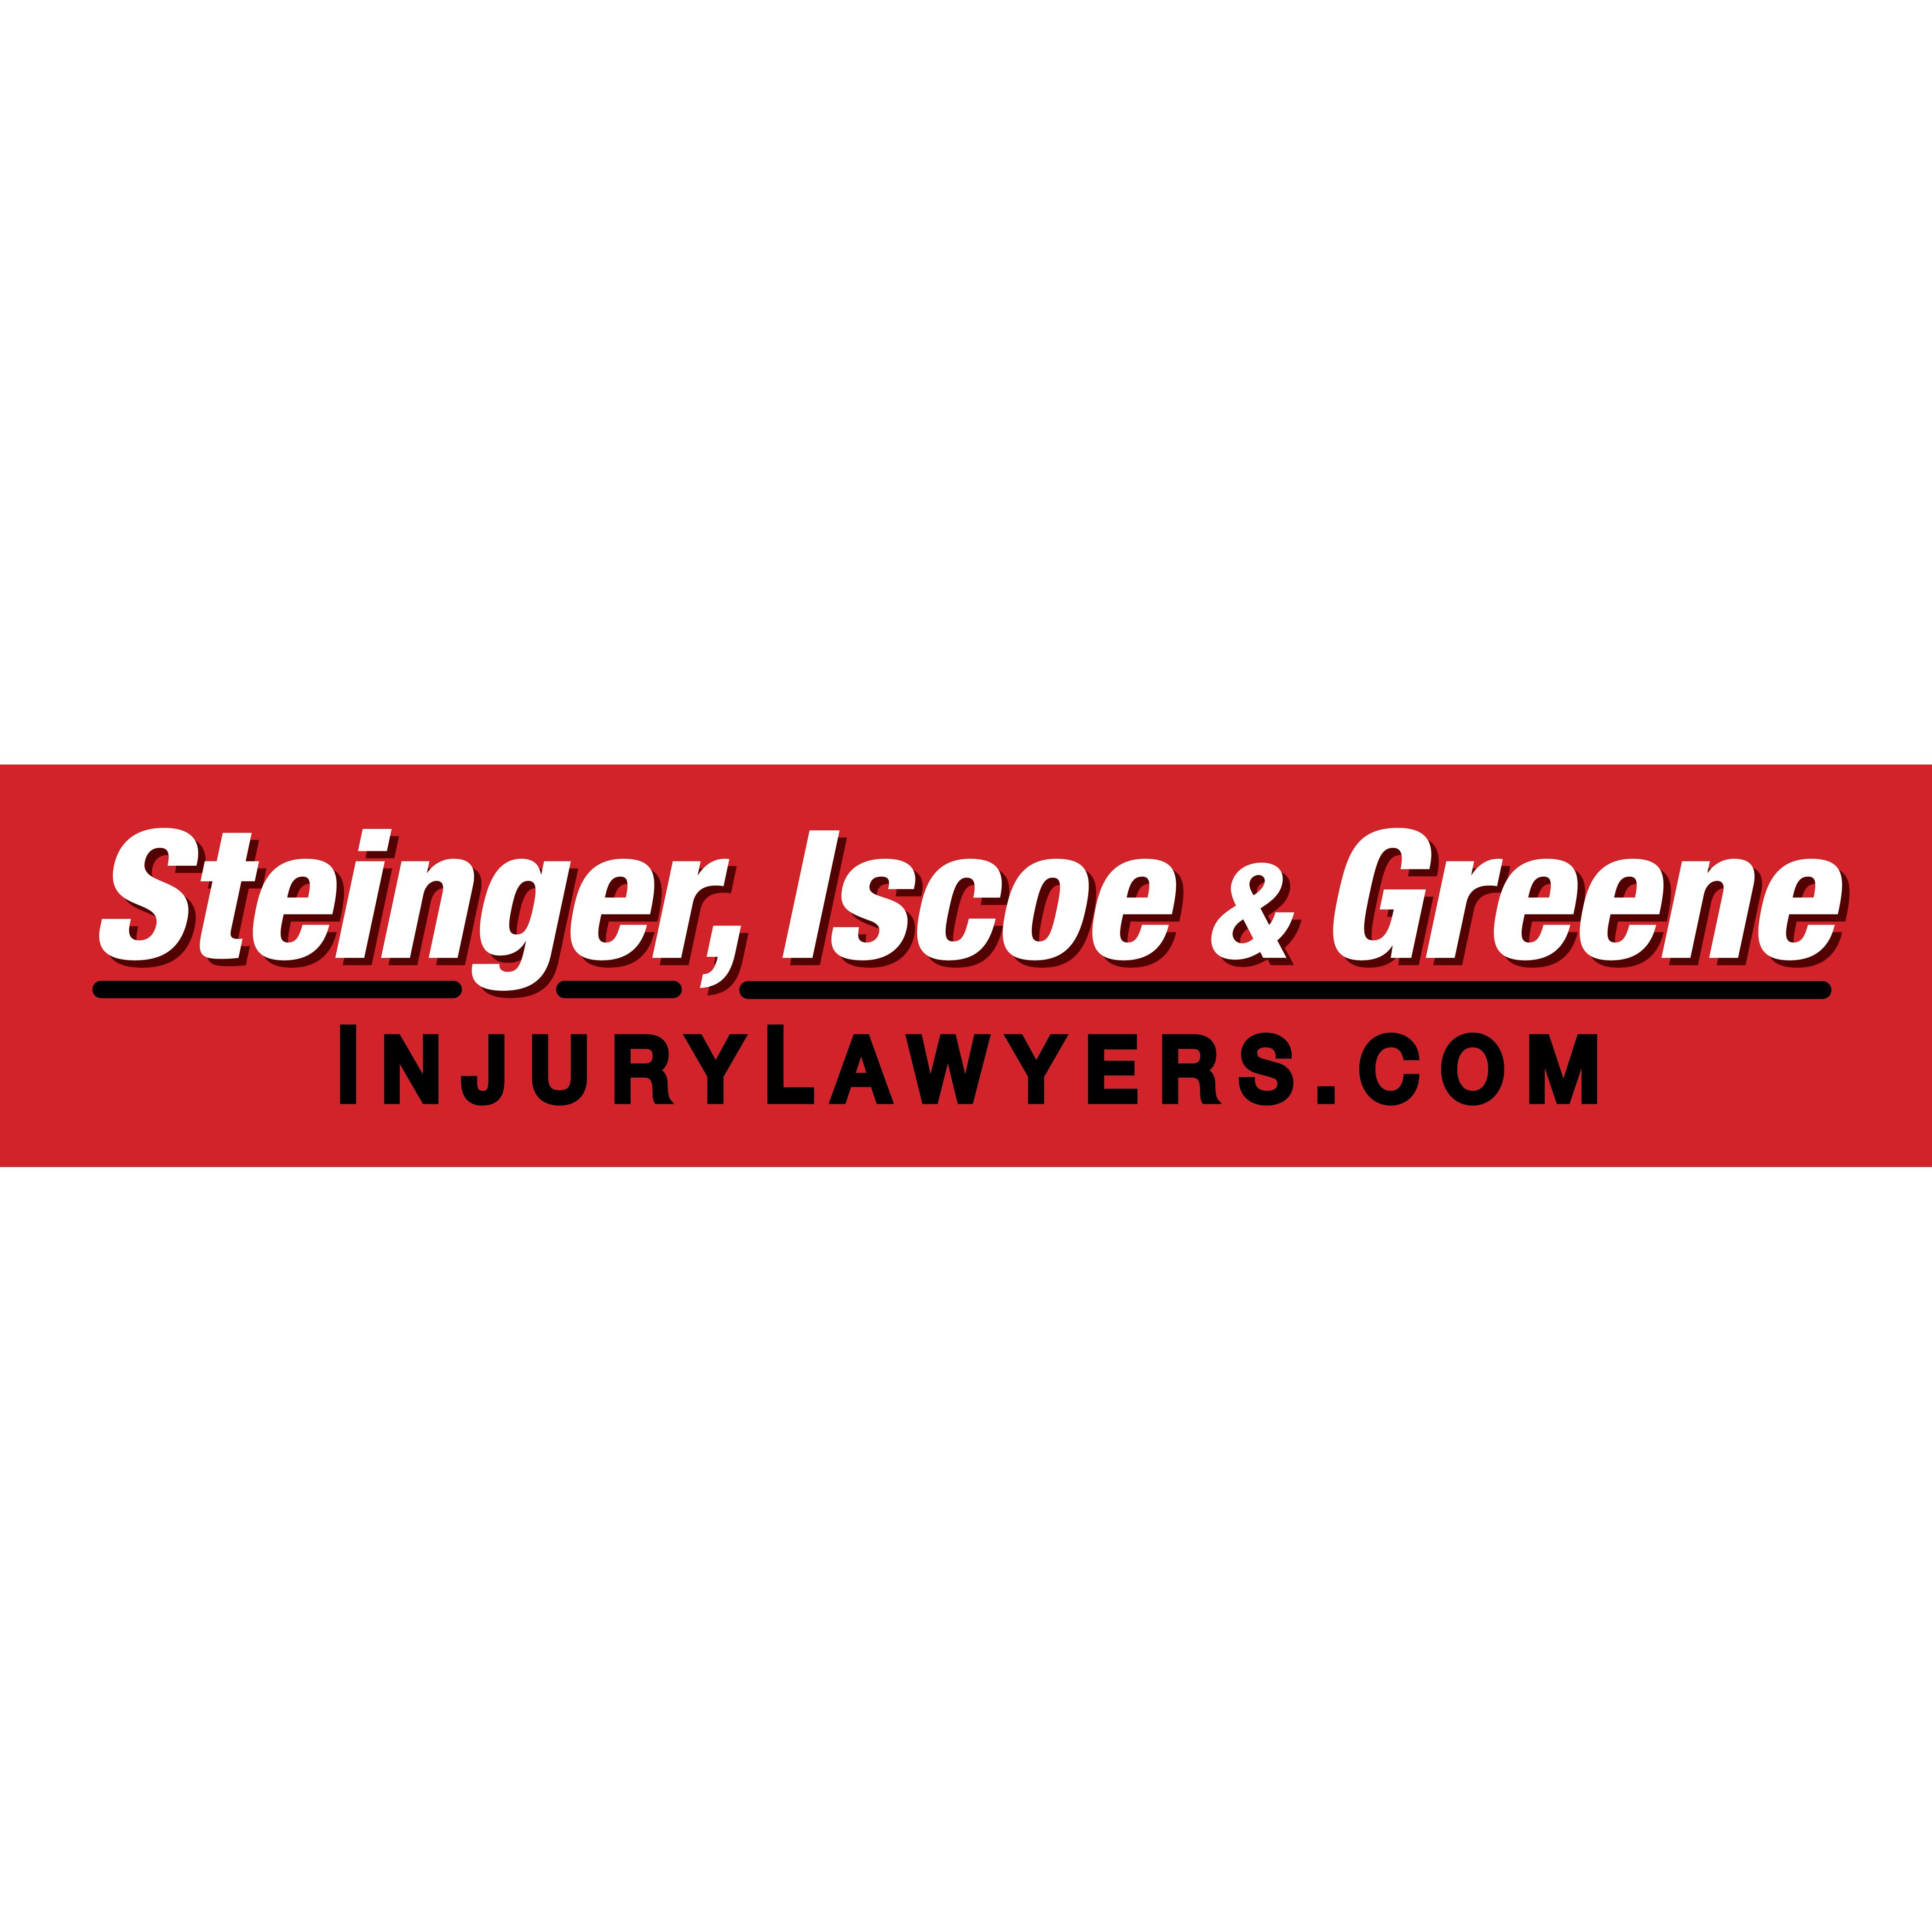 photo of Steinger, Iscoe & Greene